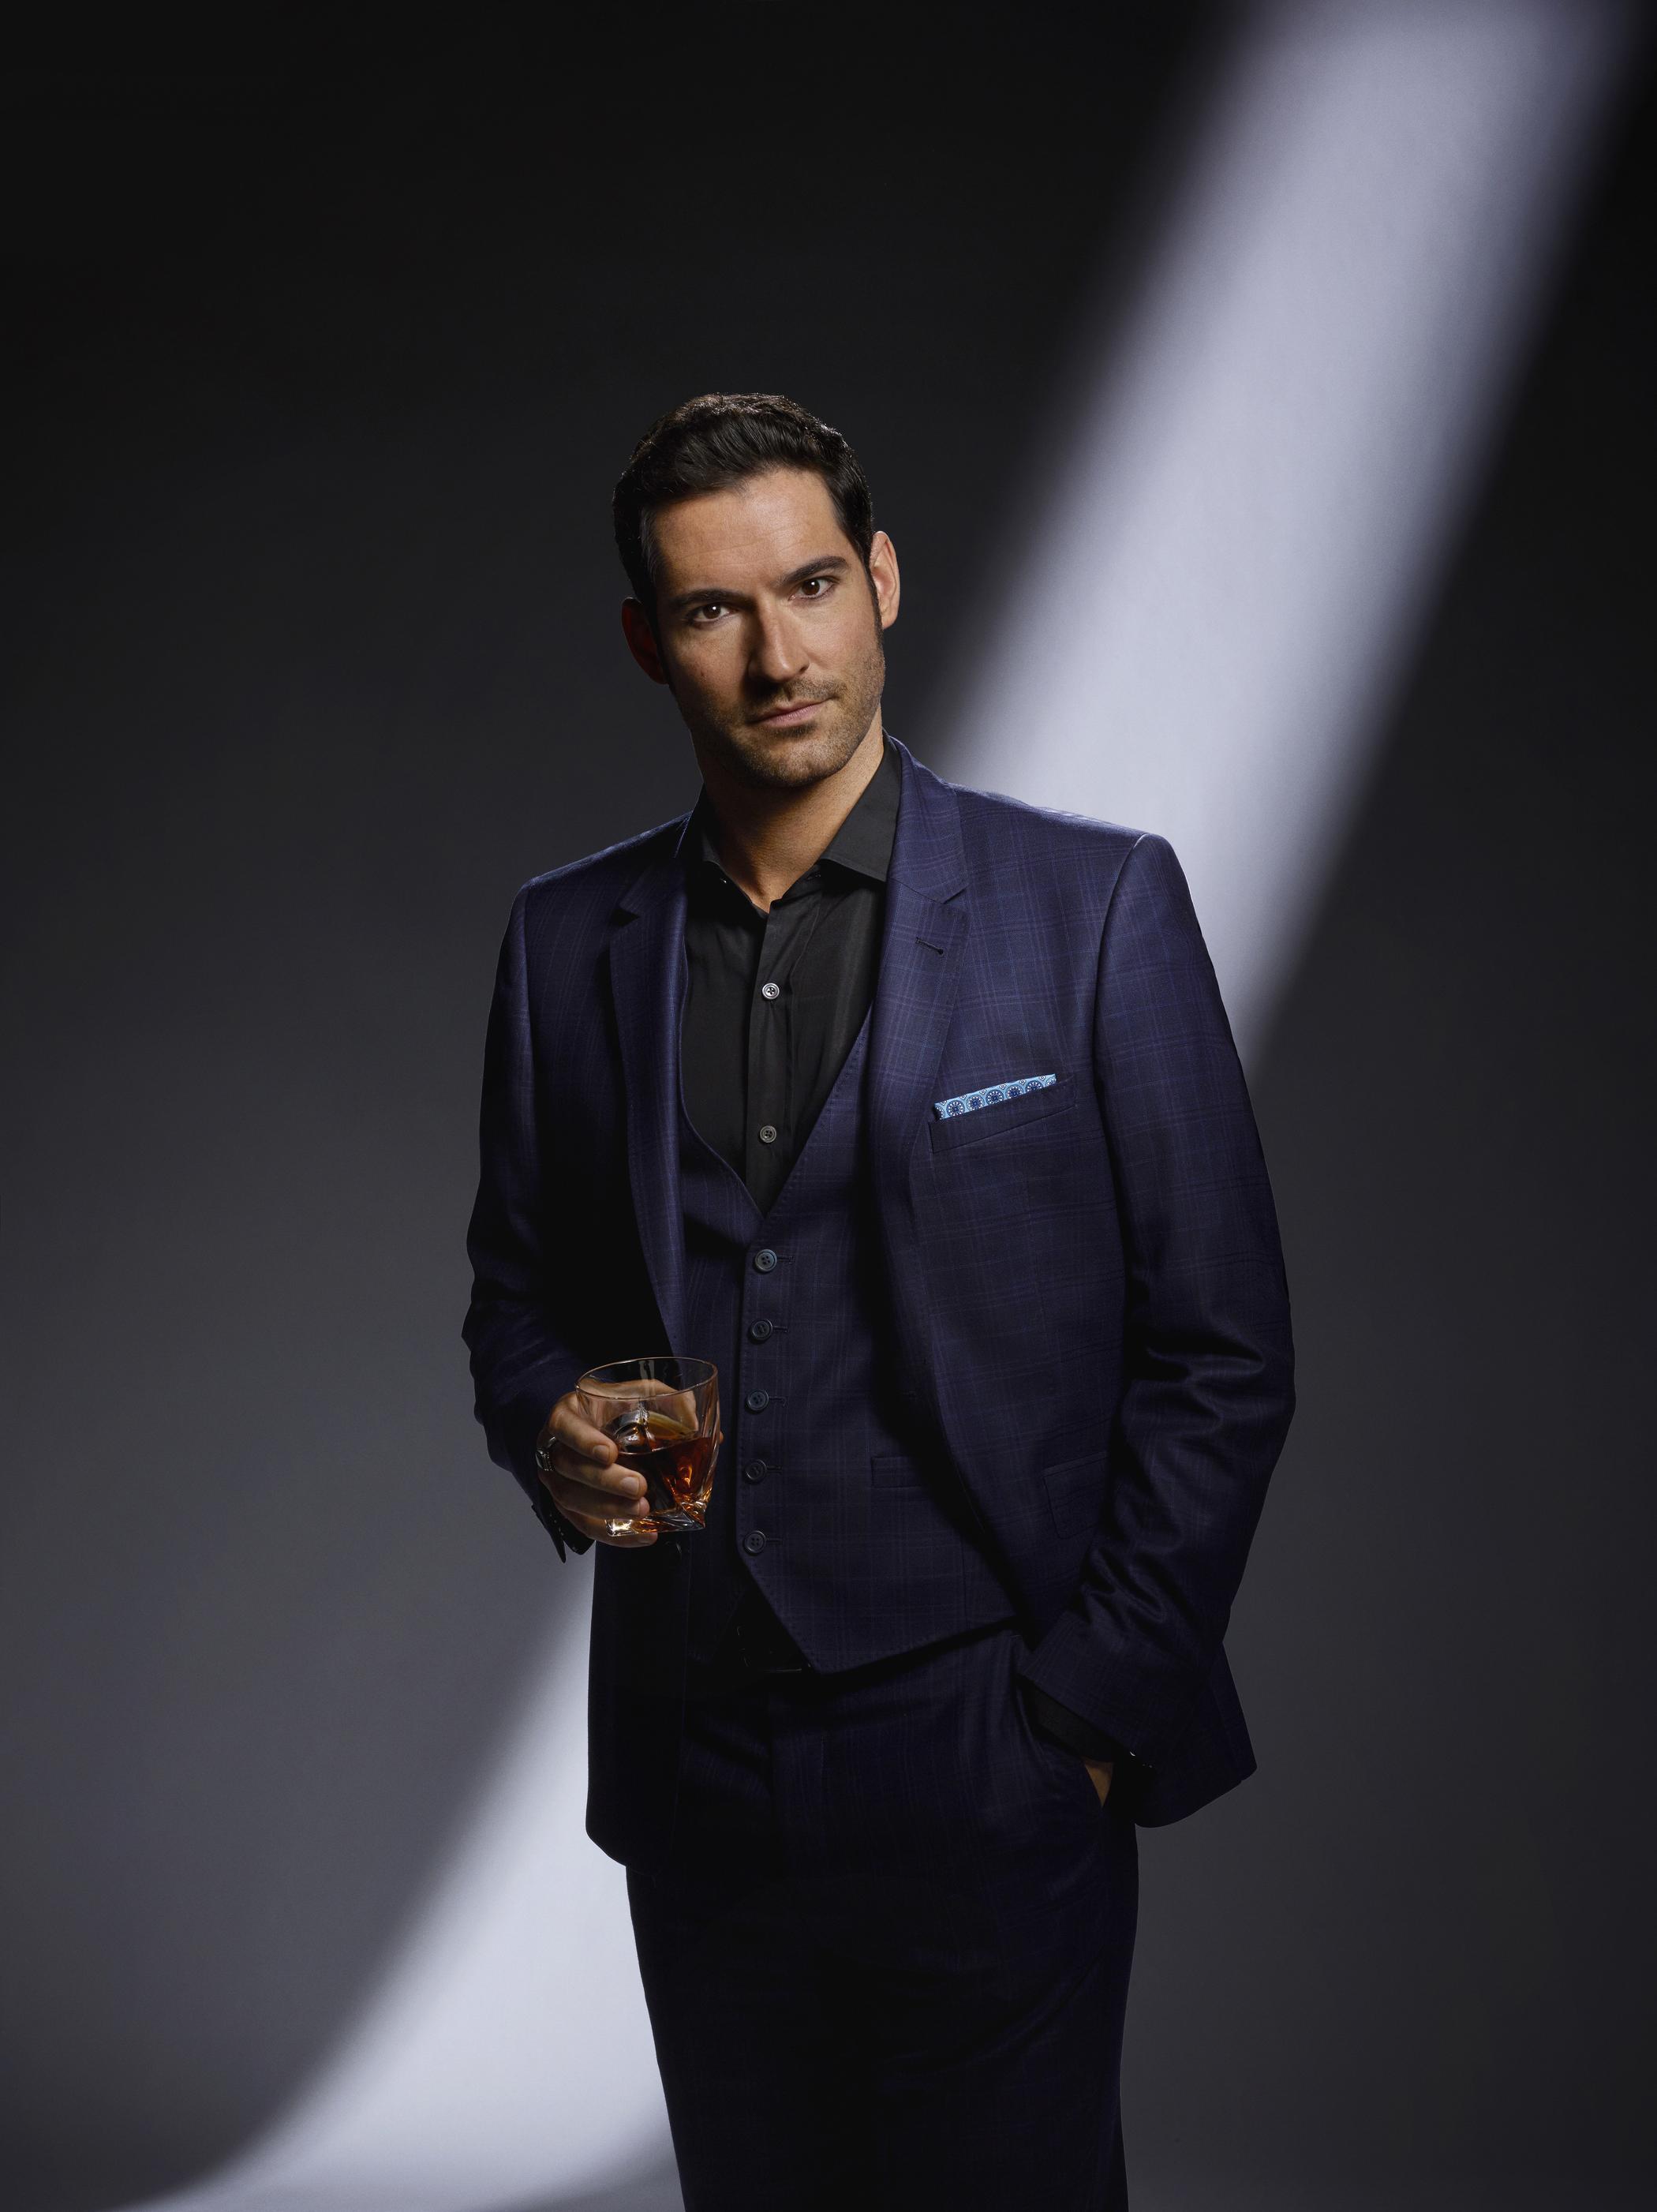 Lucifer - Season 2 Portrait - Lucifer Morningstar